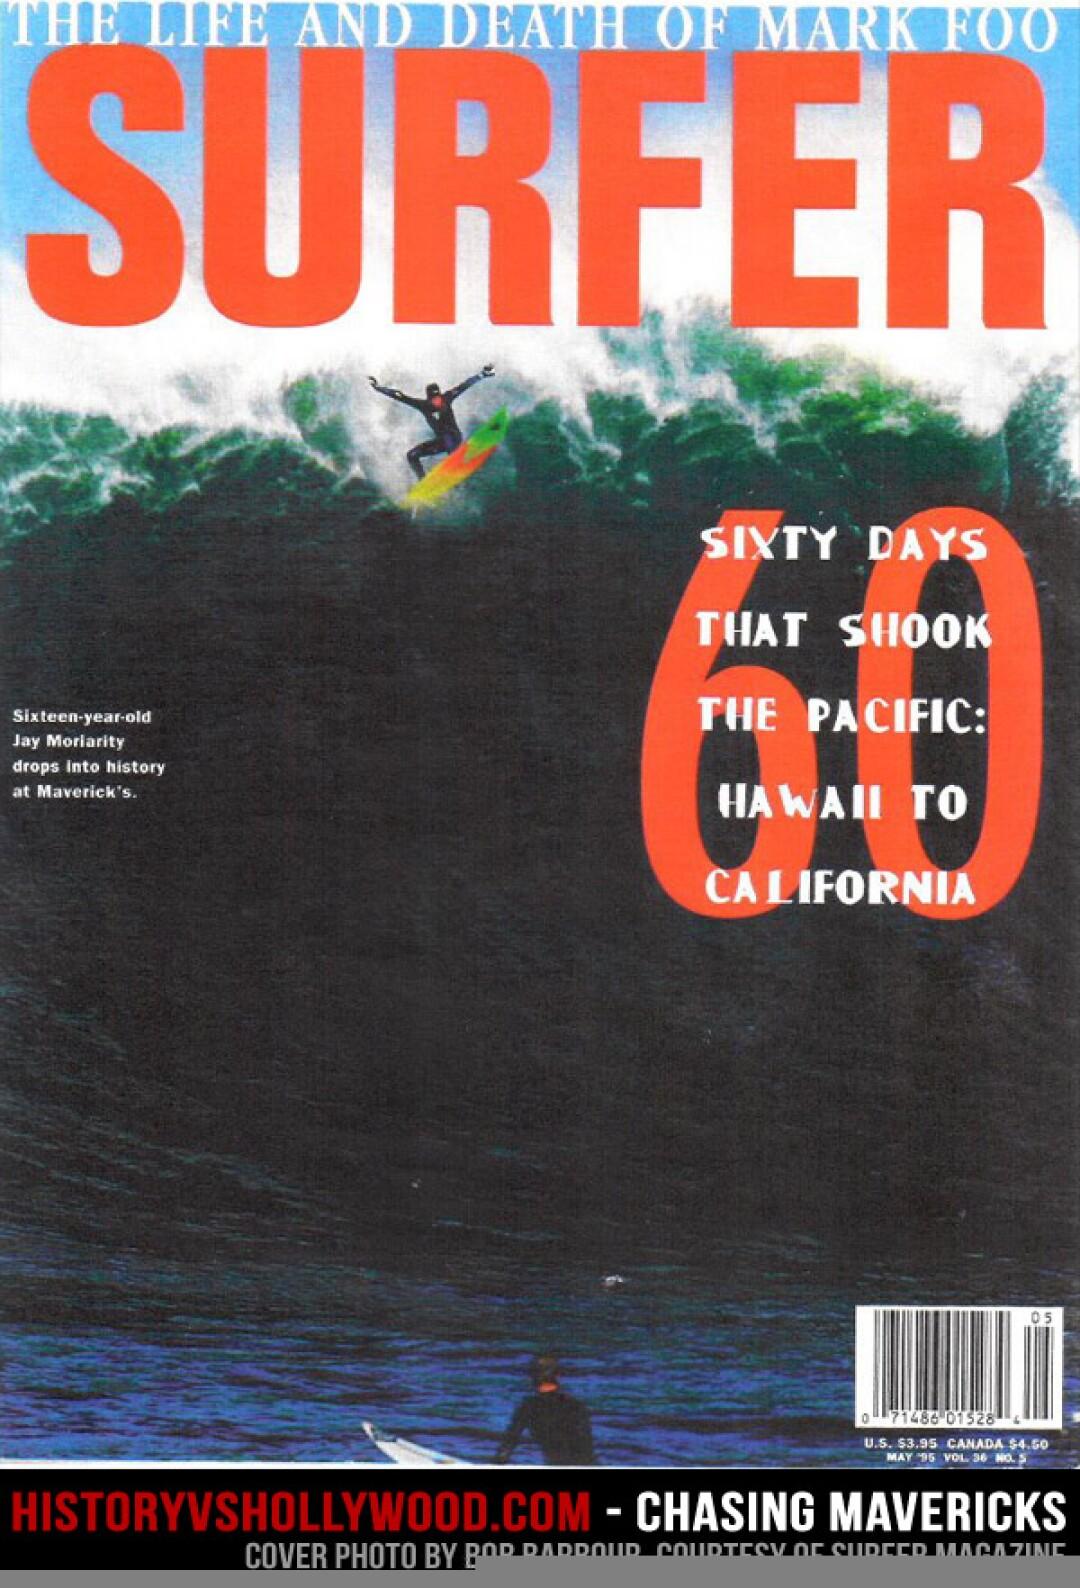 The Surfer magazine cover, and photo captured by Santa Cruz photographer Bob Barbour.